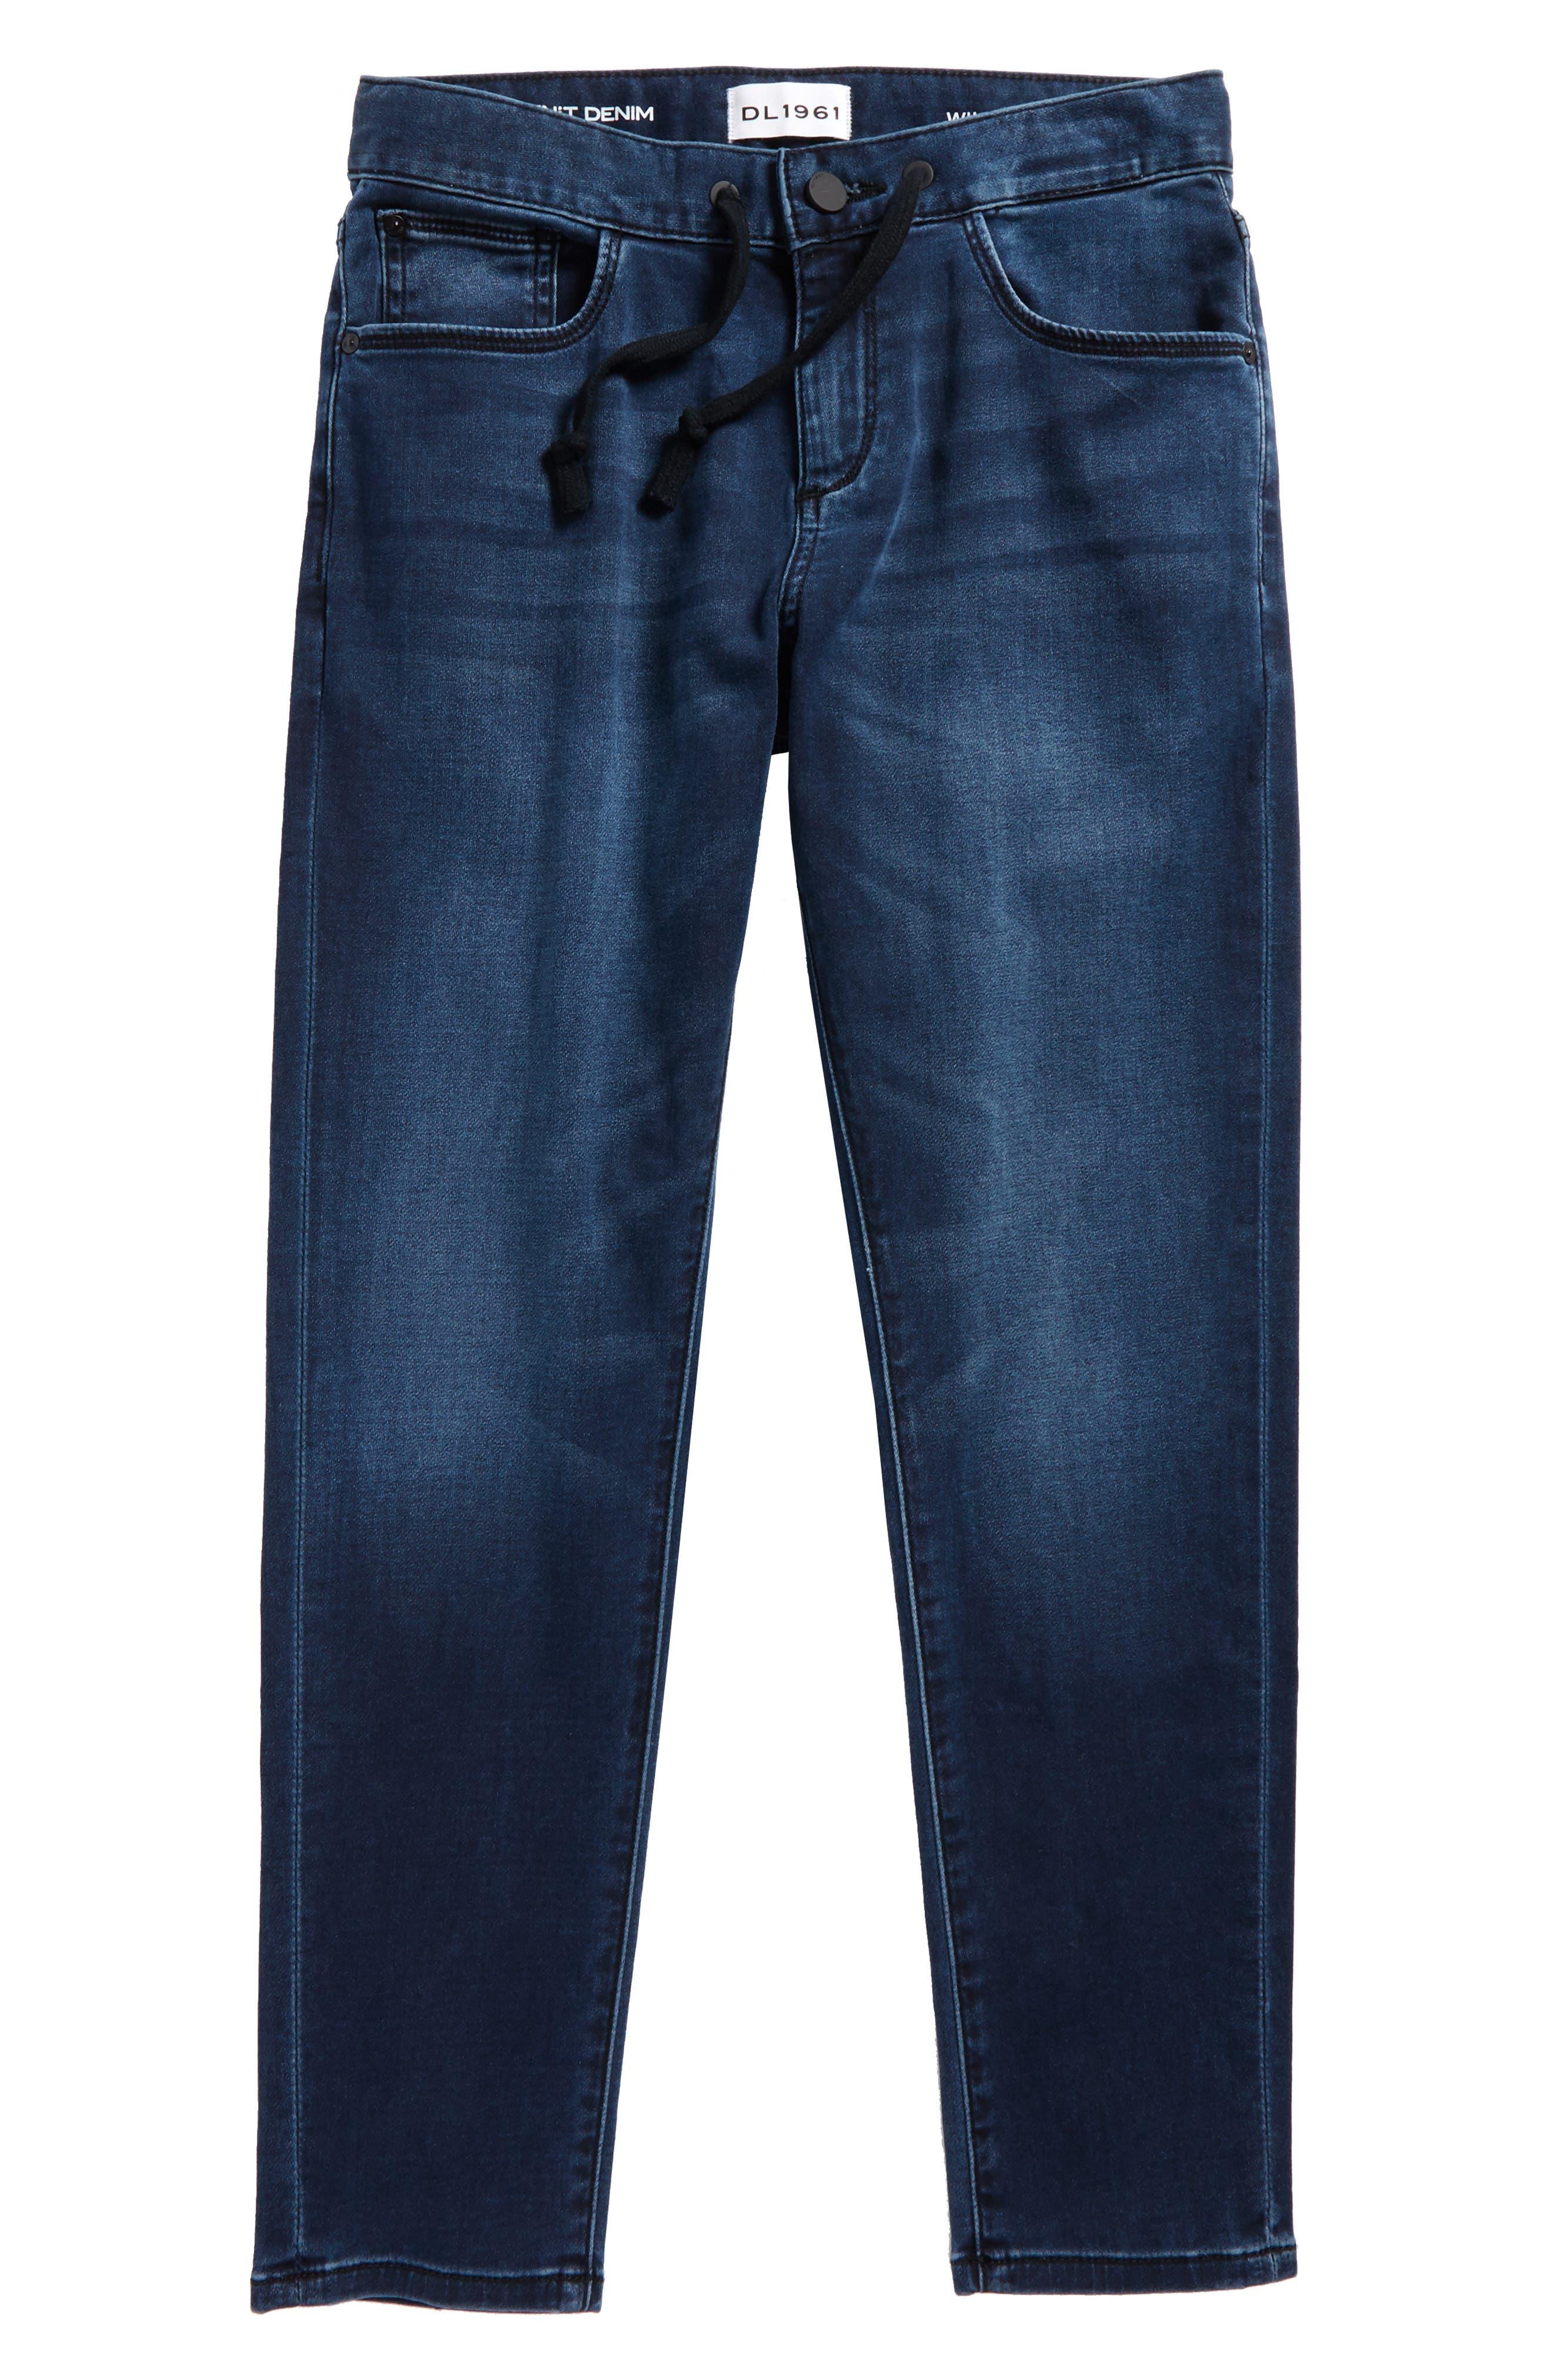 William Drawstring Jeans,                         Main,                         color, RESERVE